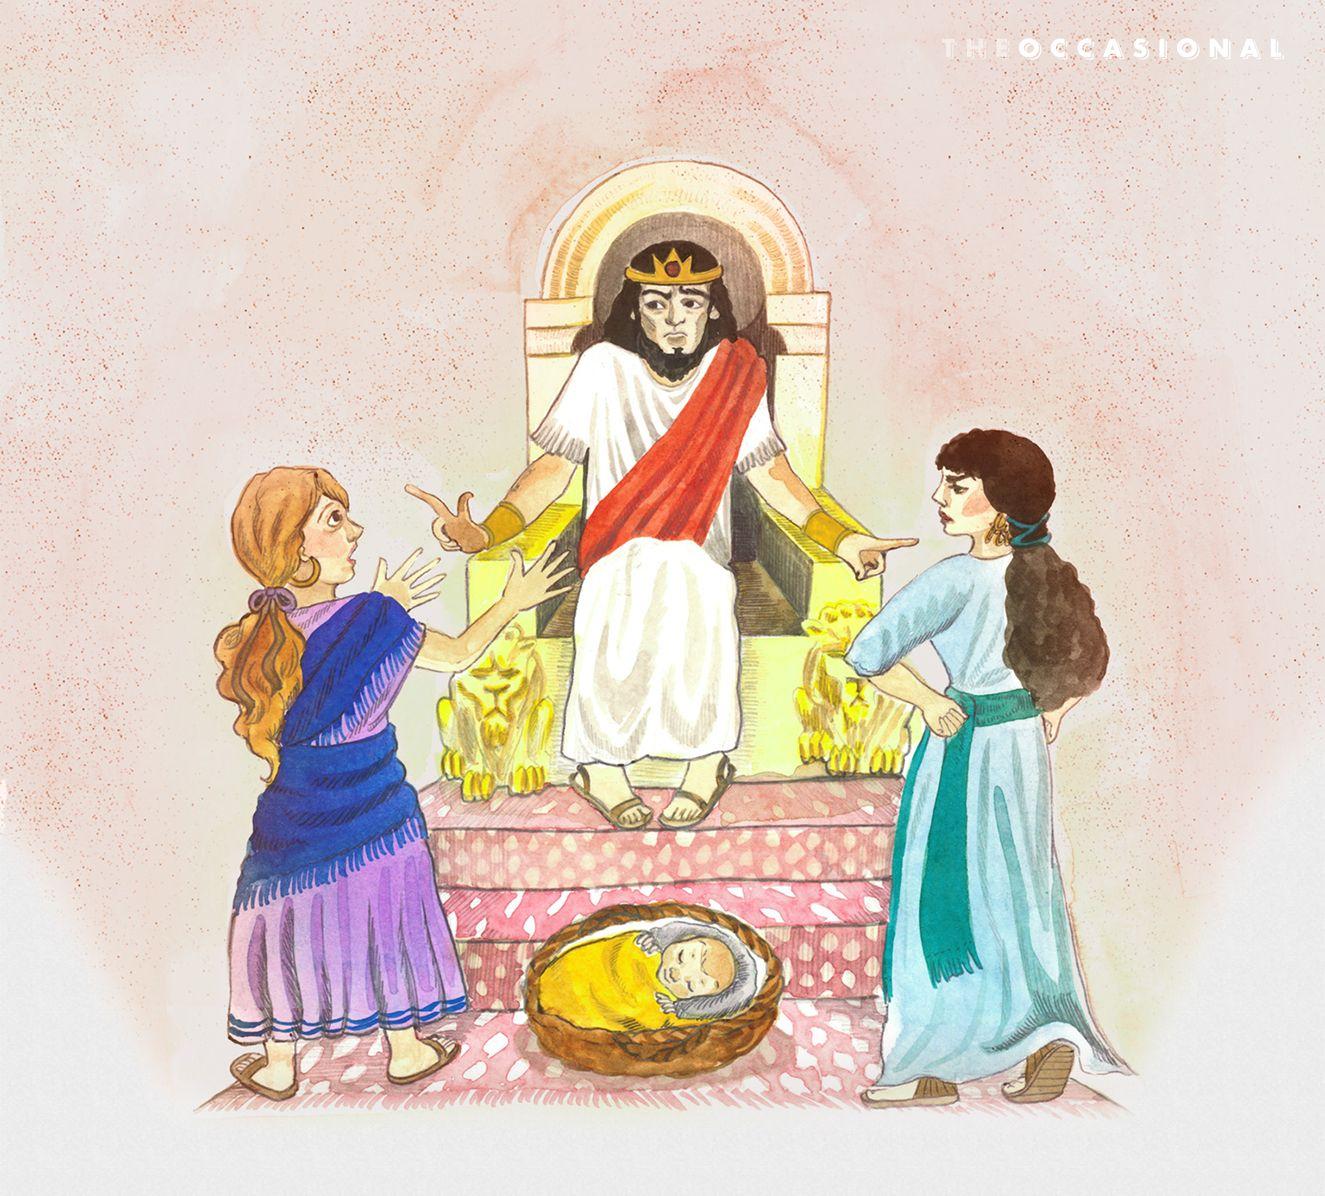 Wise King Solomon Preschool Lesson